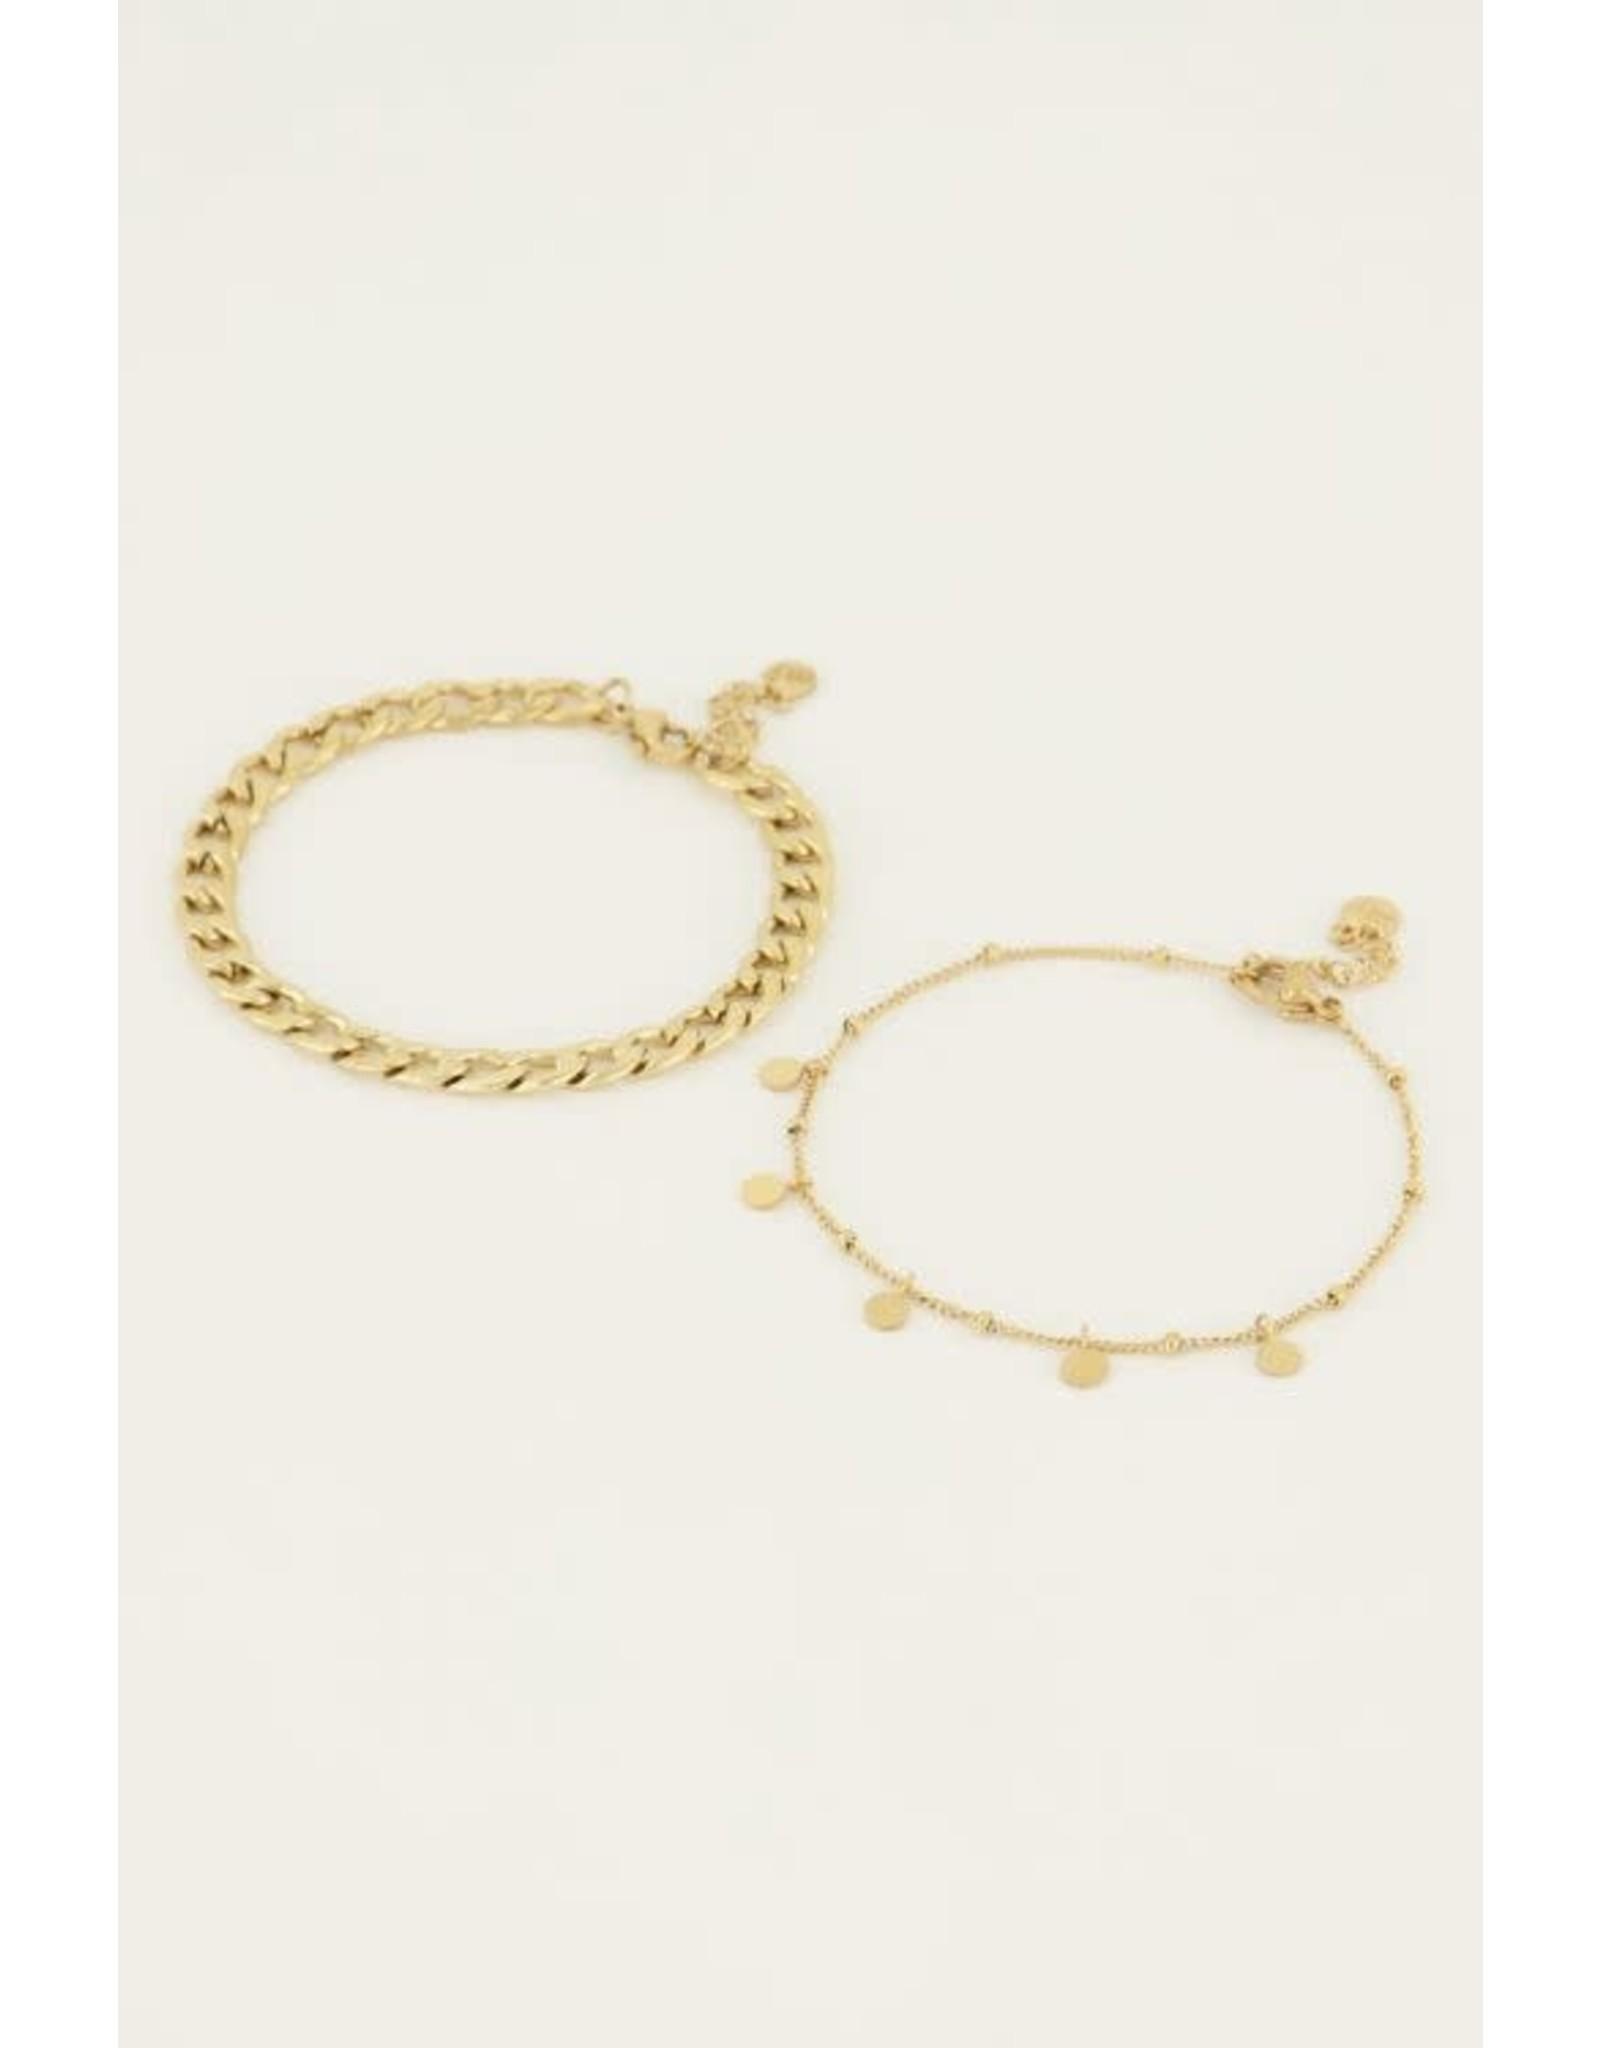 My Jewellery My Jewellery  armbanden set muntjes